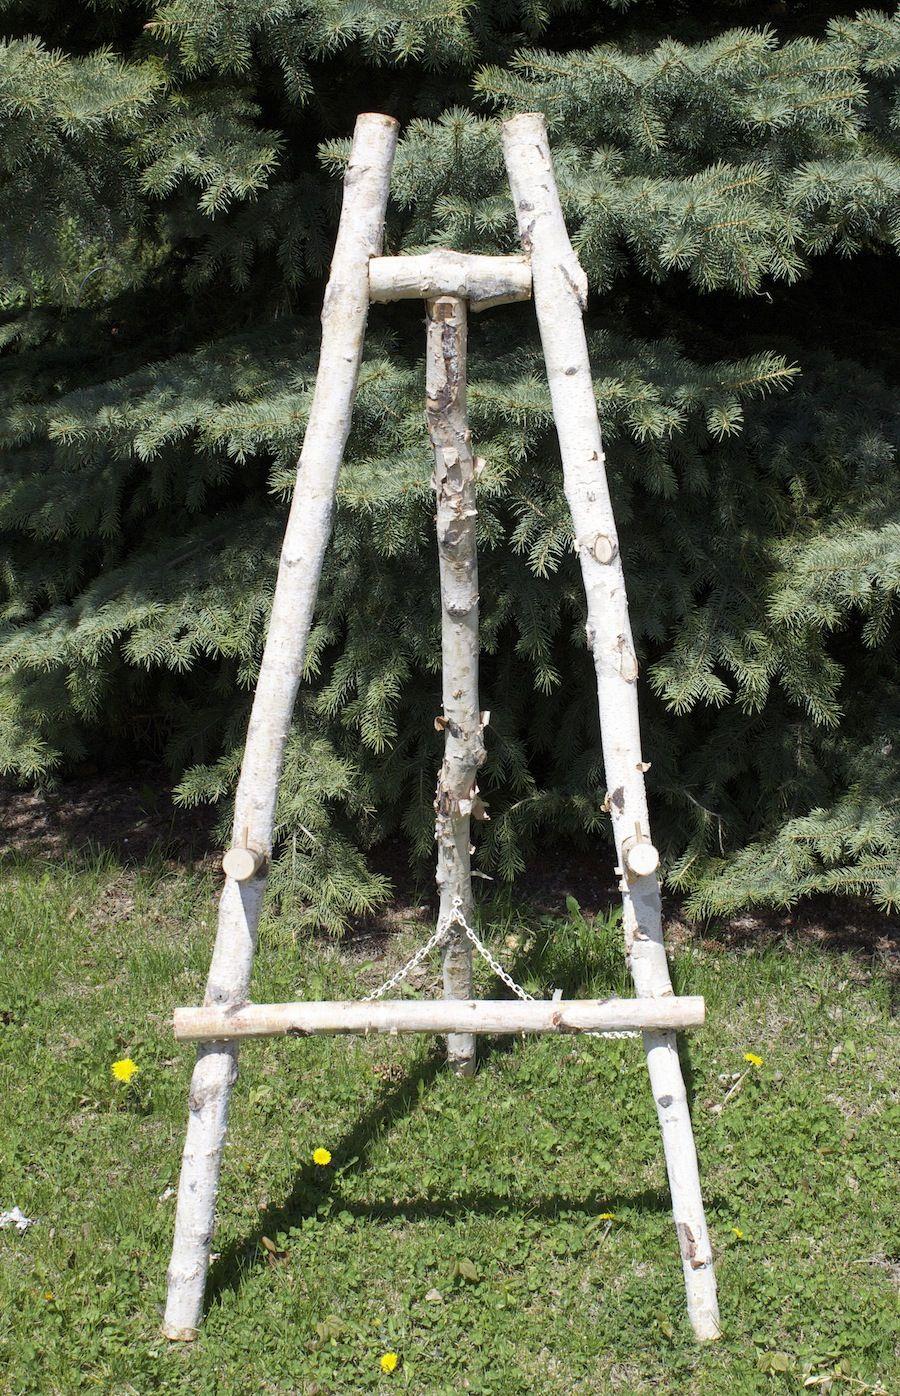 Birch Easel For Rent Tall And Sturdybeautiful Www - Beautiful diy birch bark lamp